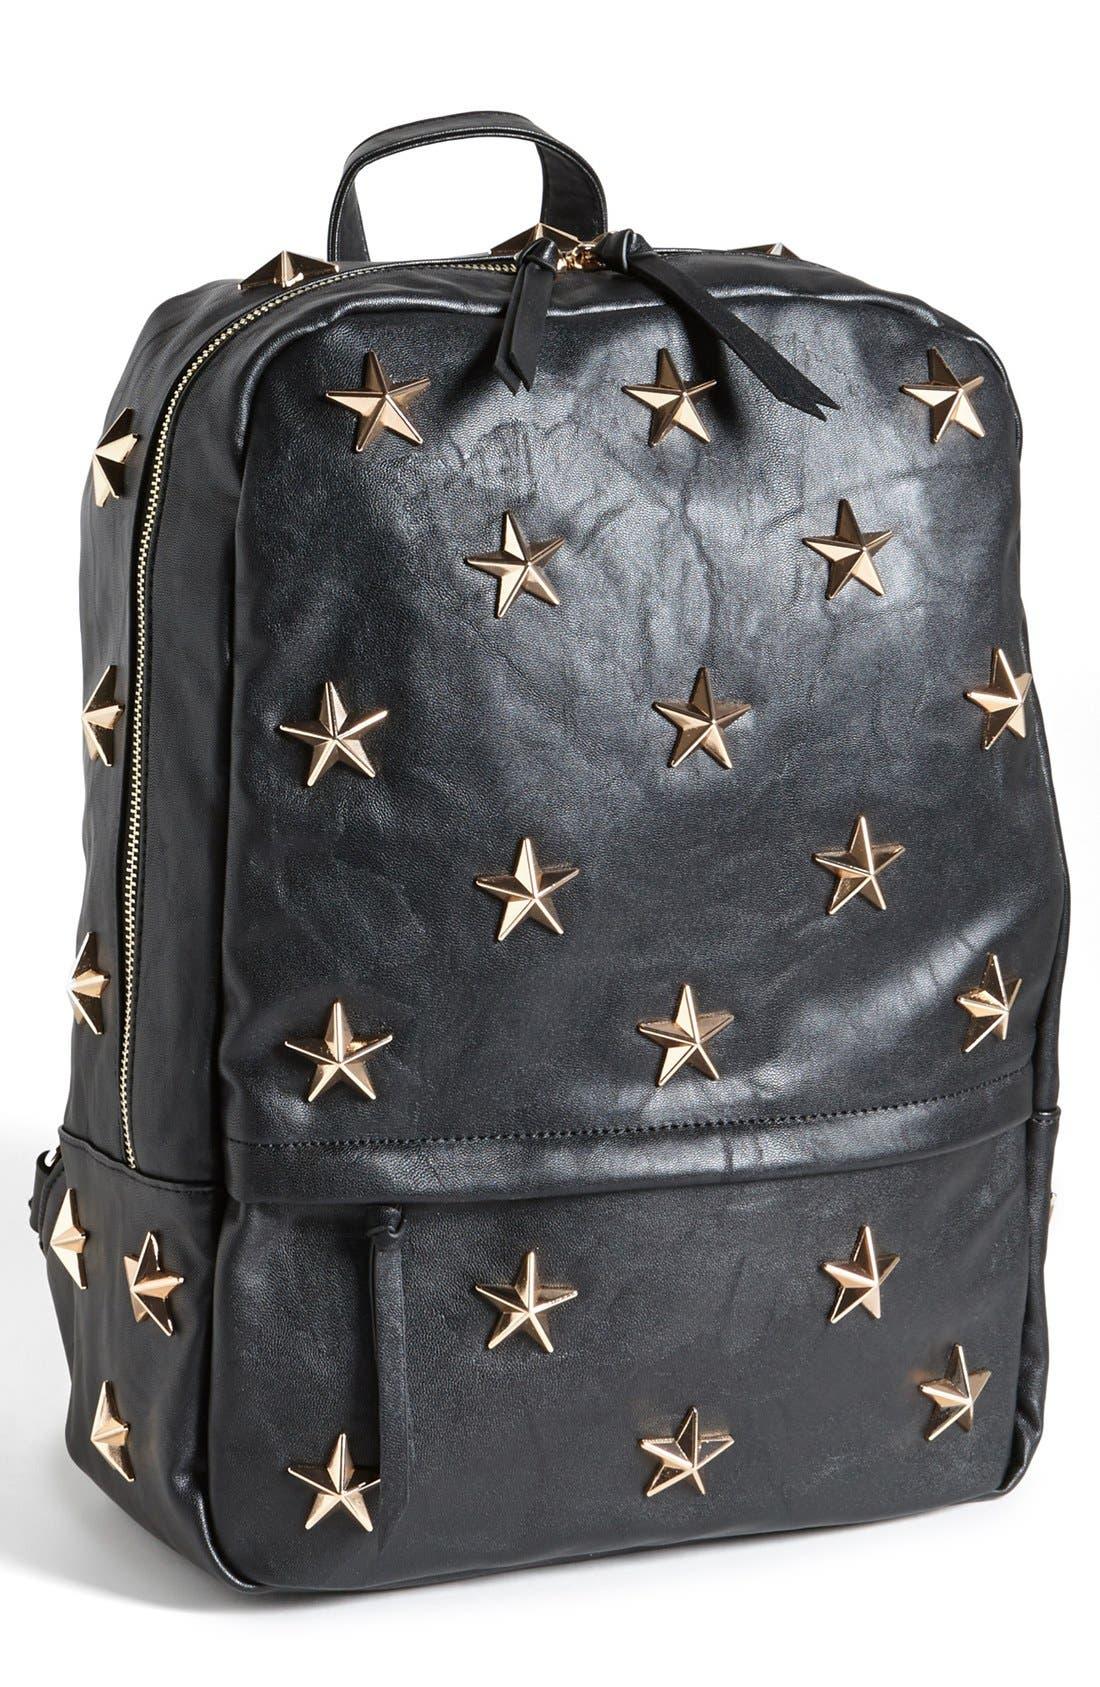 'Star' Stud Backpack,                             Main thumbnail 1, color,                             001